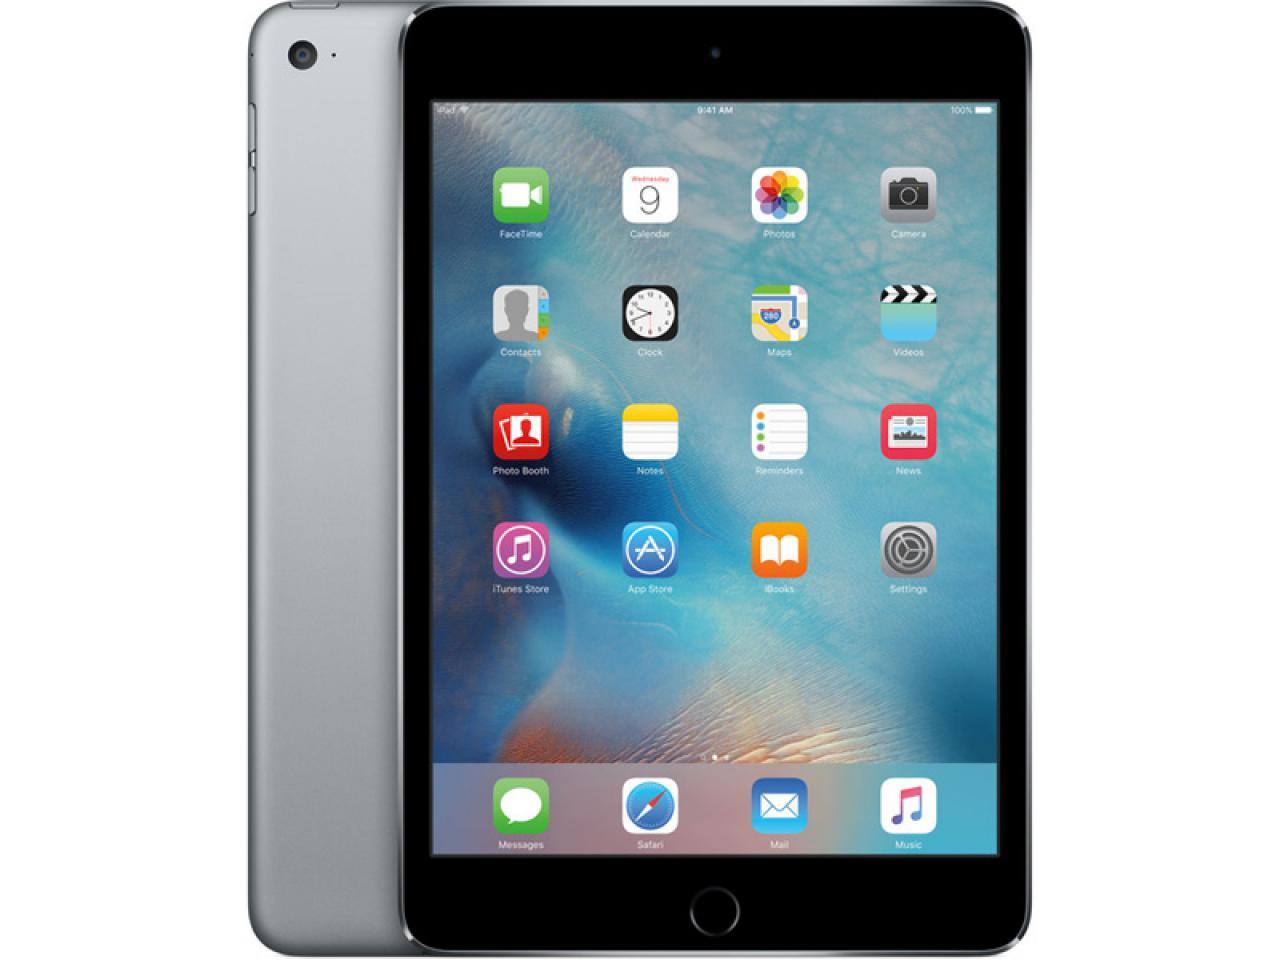 Apple iPad 4 3G-4G A1460 Spacegrau  - shop.bb-net.de